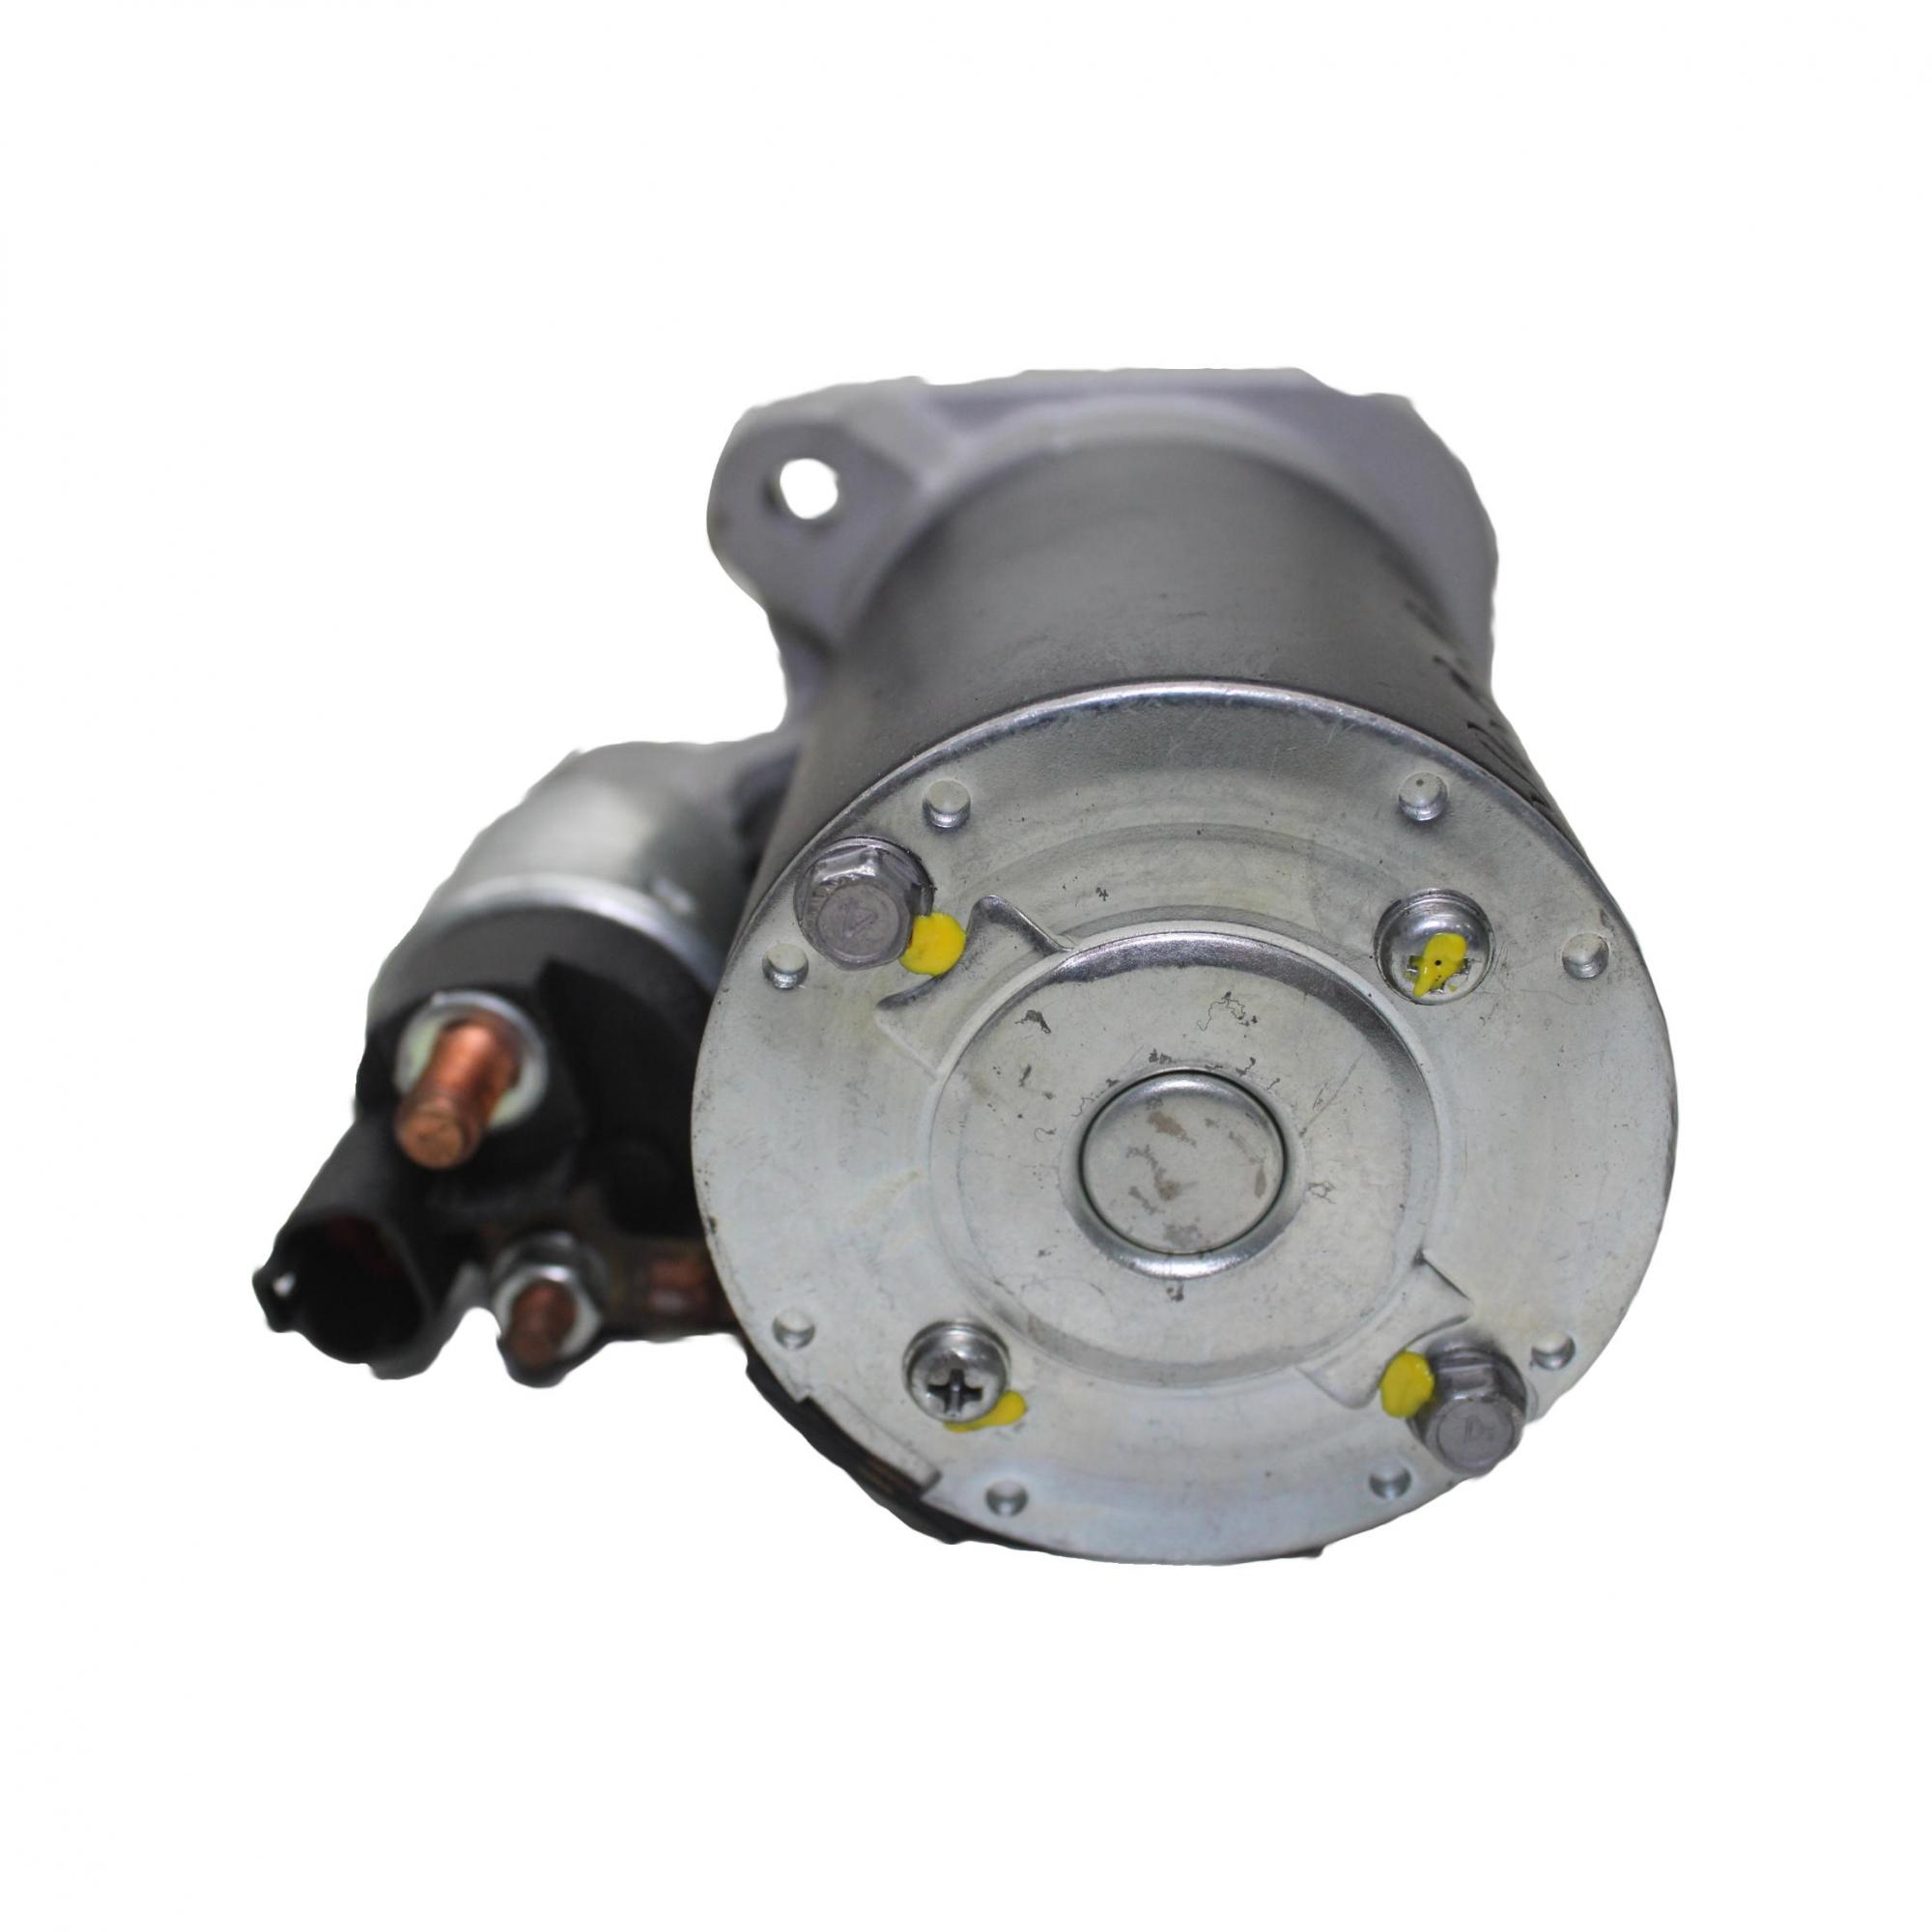 Motor Arranque Partida Valeo Hyundai HB20 1.6